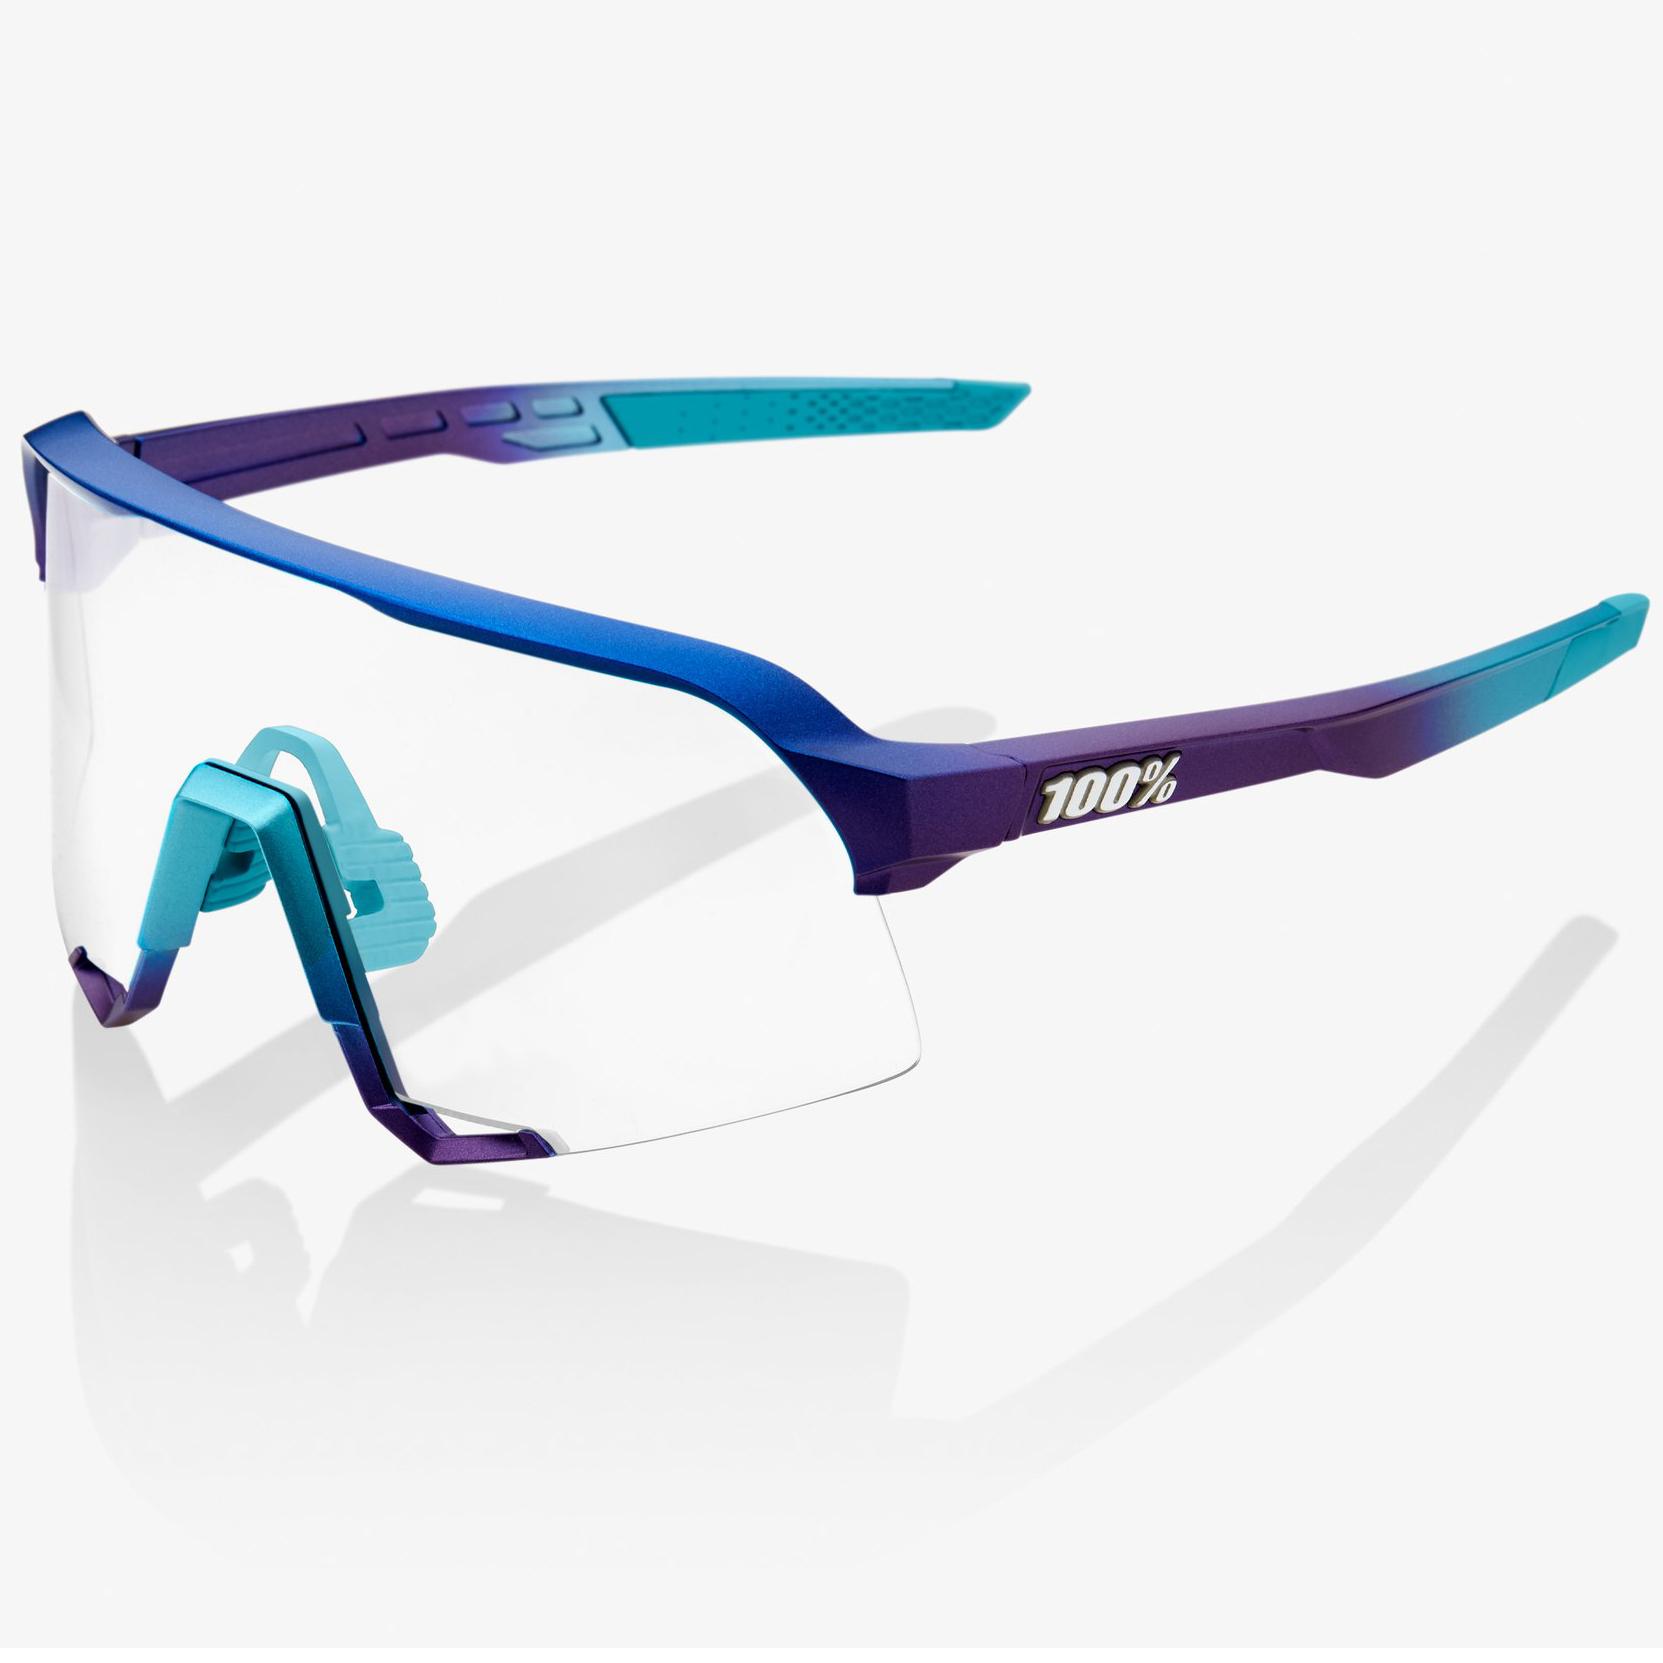 Imagen de 100% S3 Mirror Gafas - Matte Metallic Into the Fade/Blue Topaz Multilayer + Clear